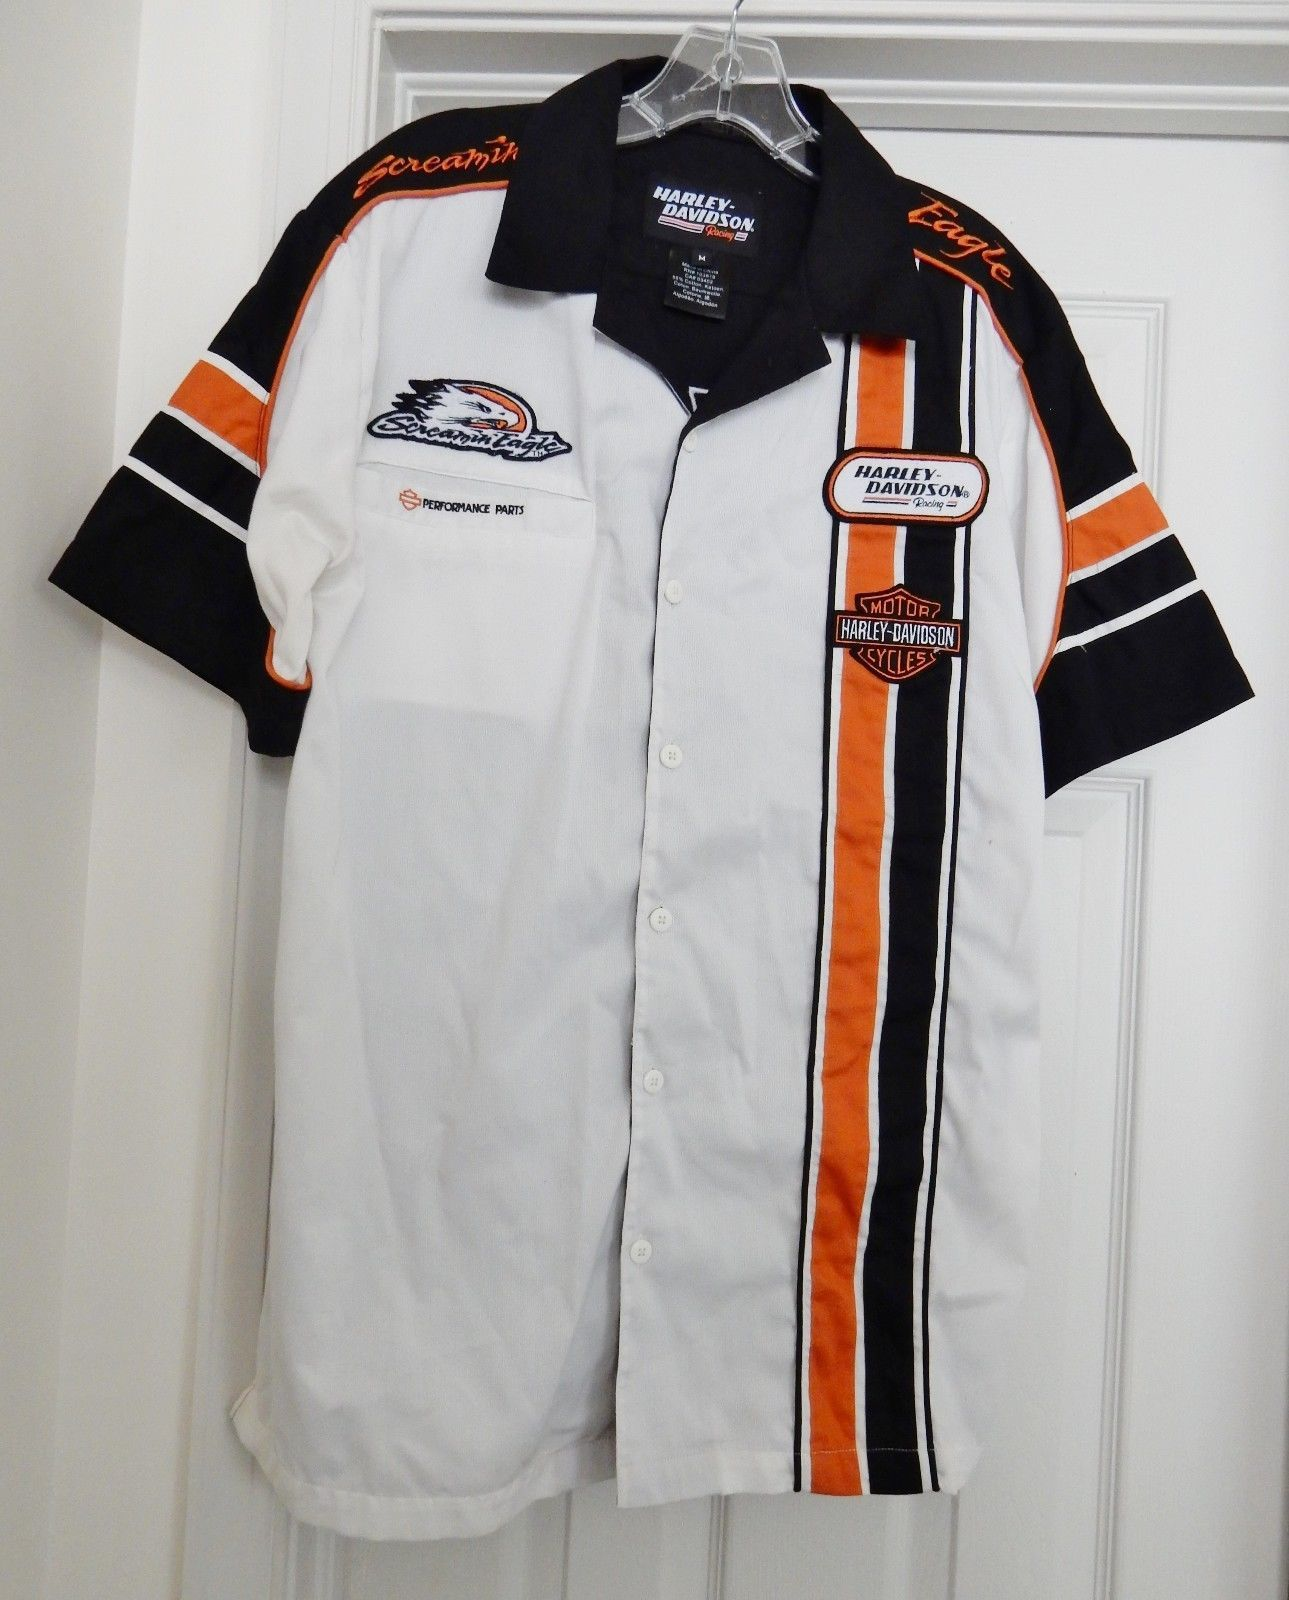 Harley-Davidson Racing Screamin' Eagle Garage Shirt Top S/S Cotton Blend Size M